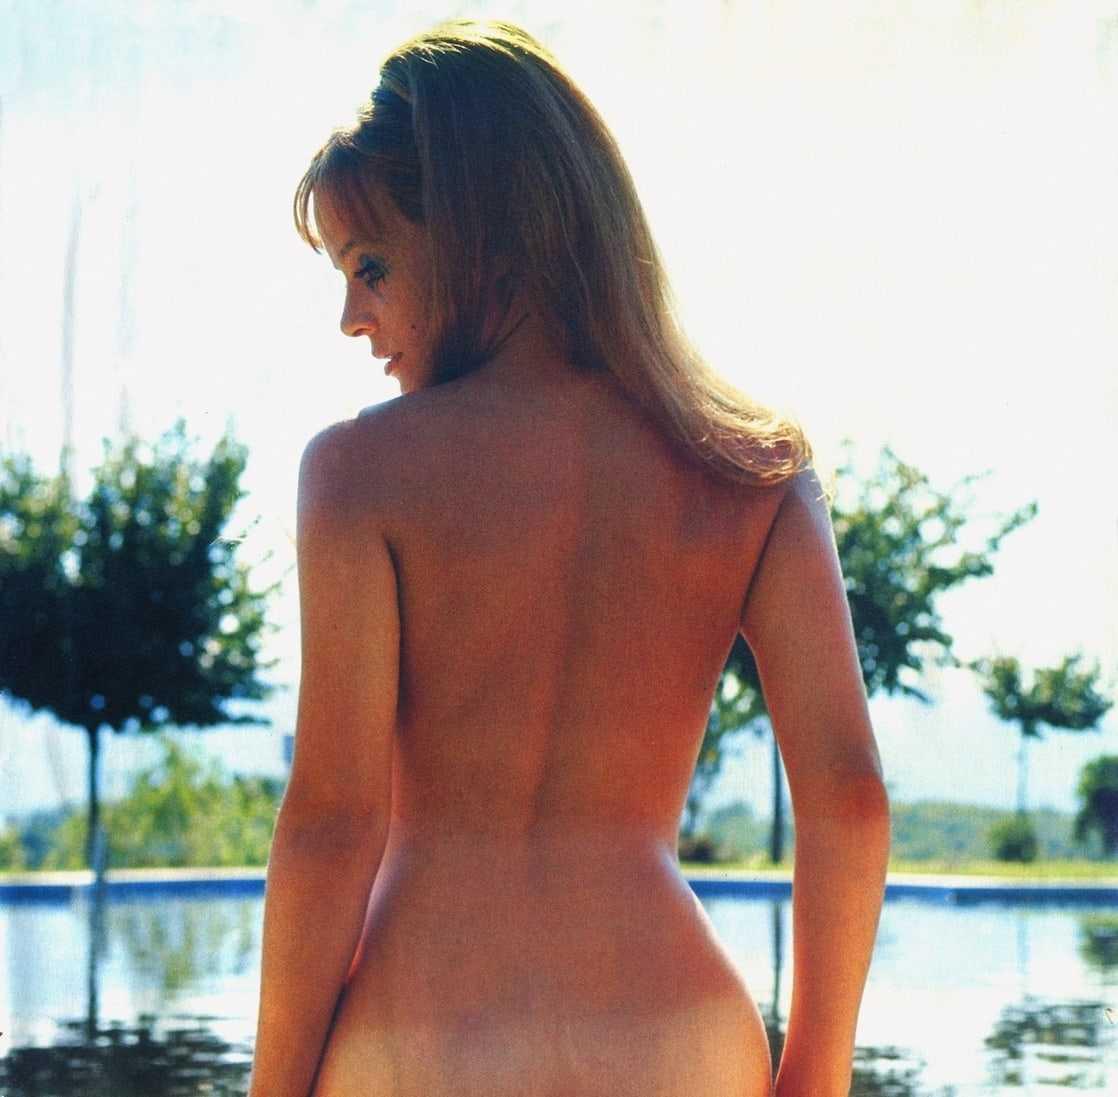 laura antonelli near-nude